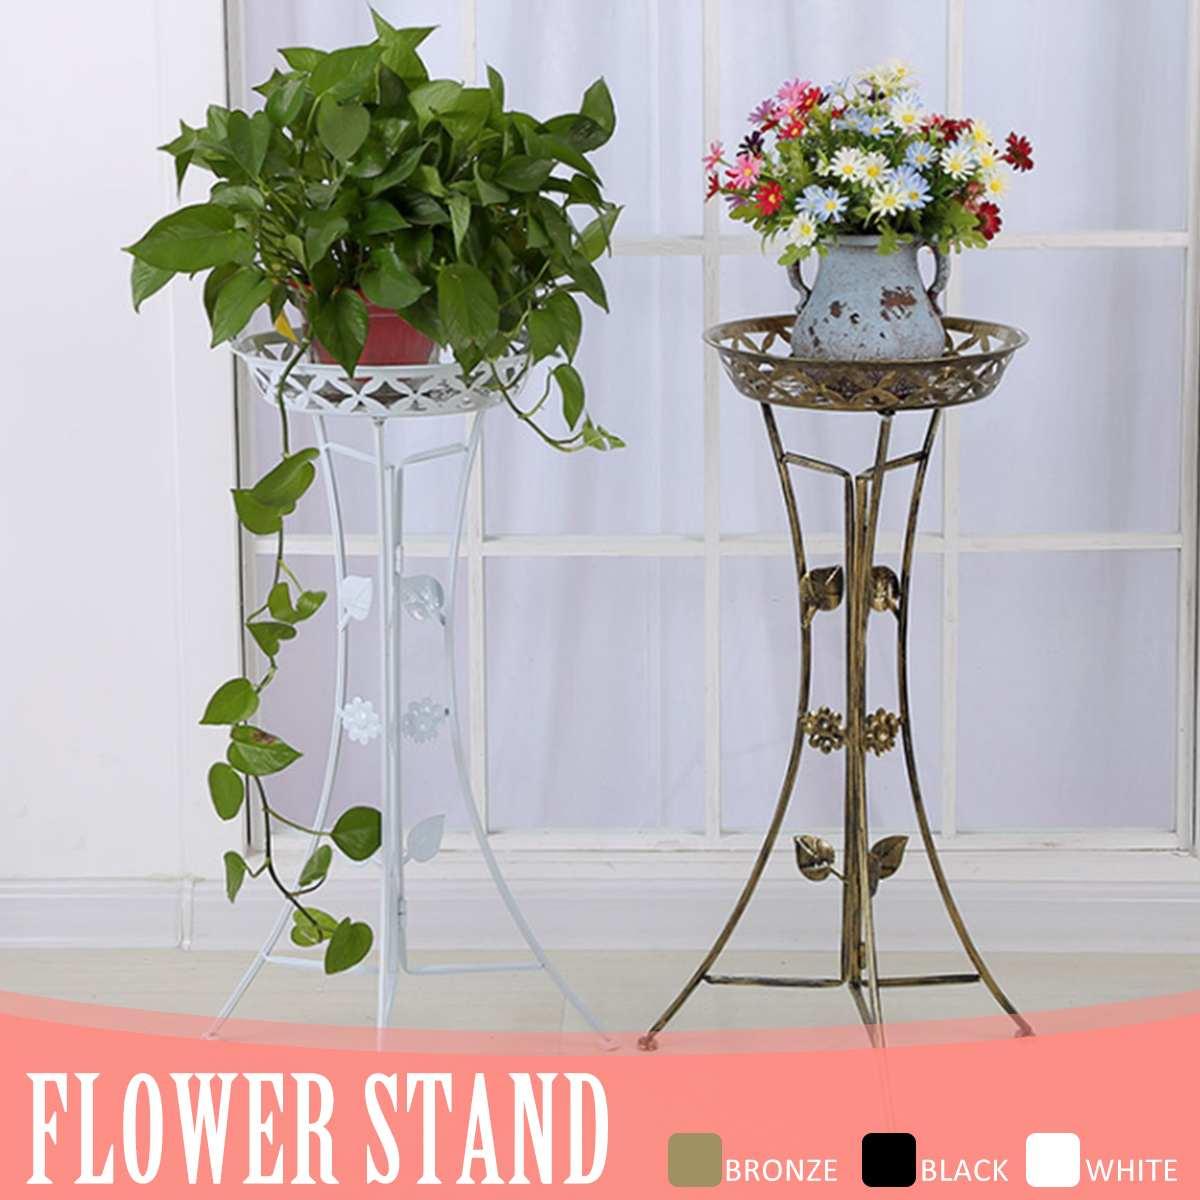 Metal Plant Stand Shelf Black/White/gold Elegant Display Garden Balcony Flower Pot Shelf Rack Holder Home Indoor Decor